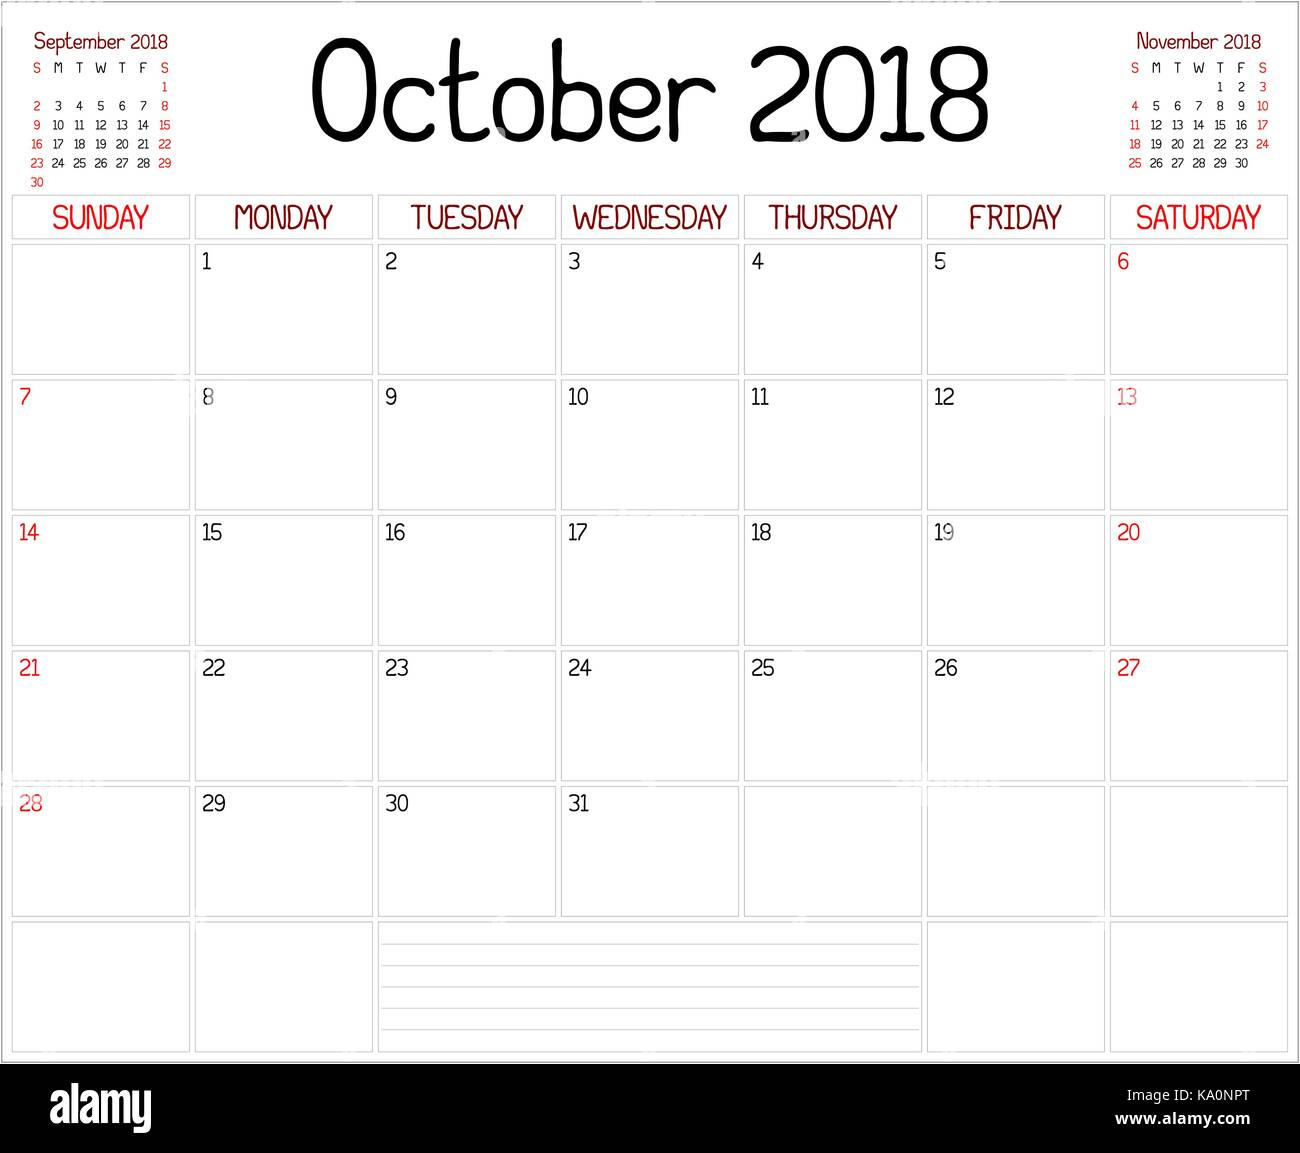 daily calendar october 2018